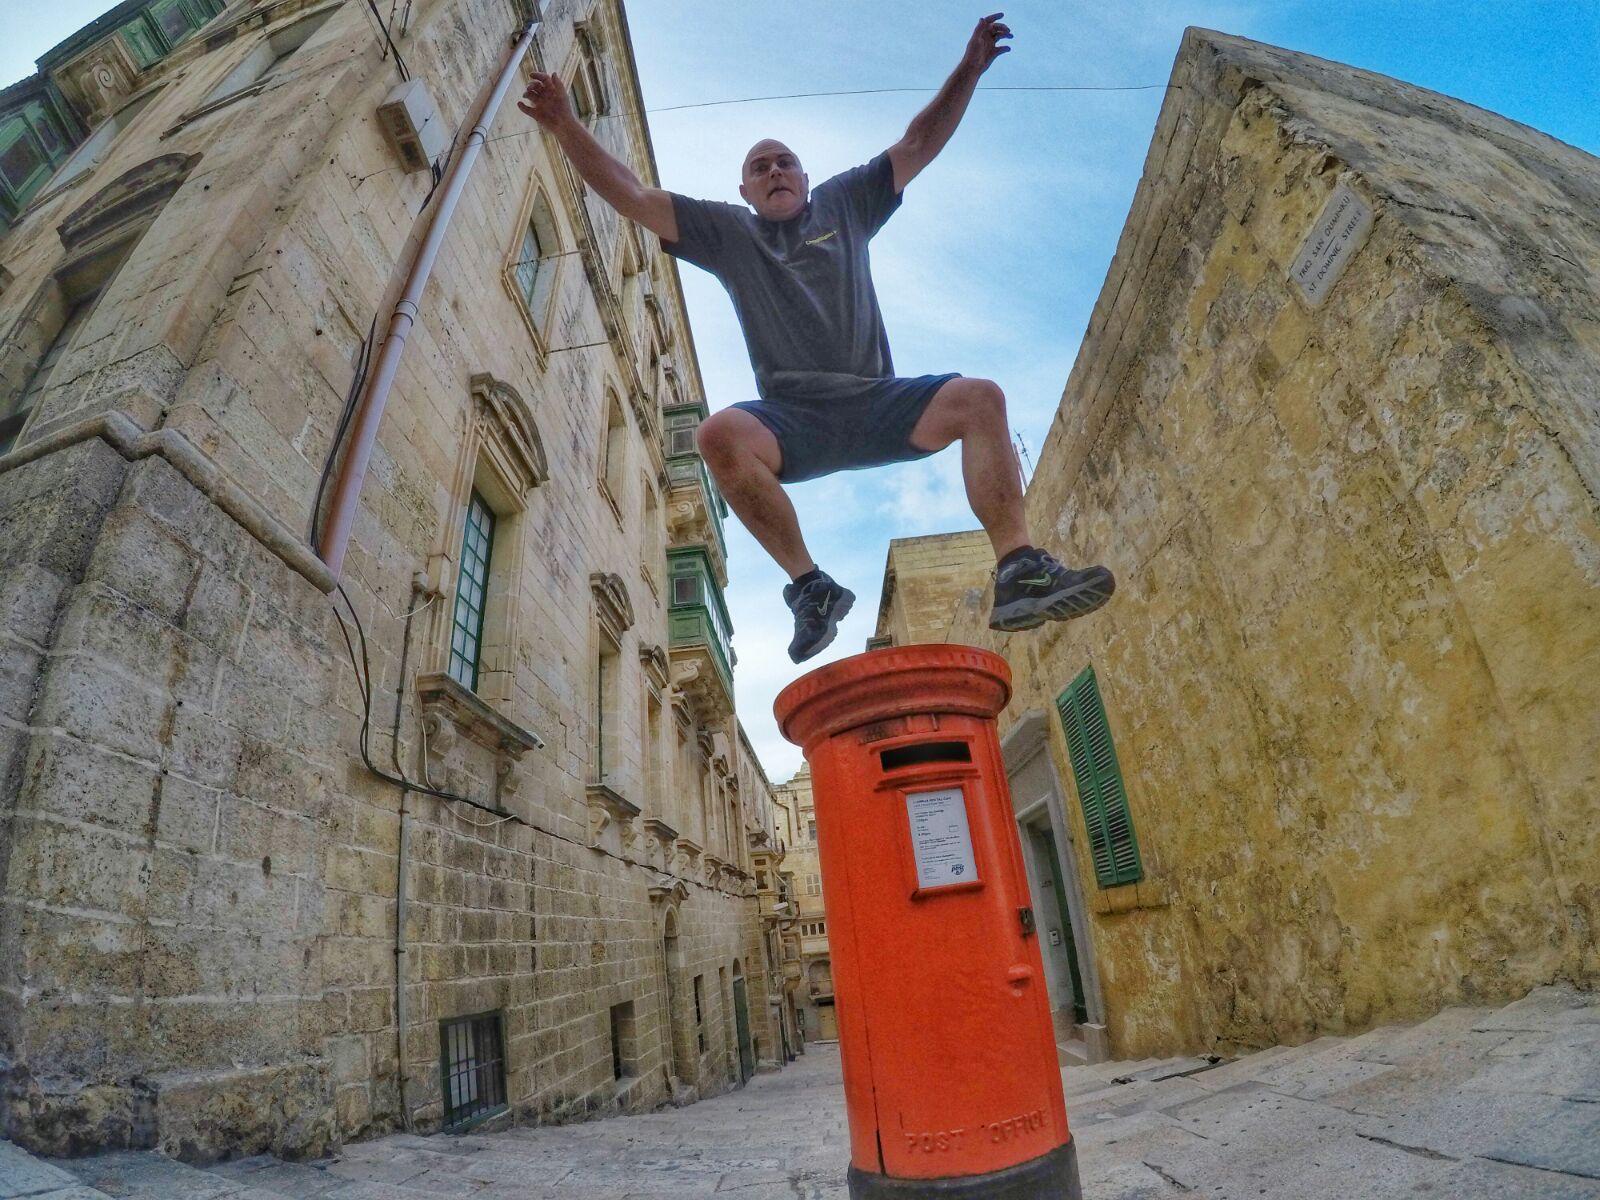 #CheapflightsChallenge Malta 6